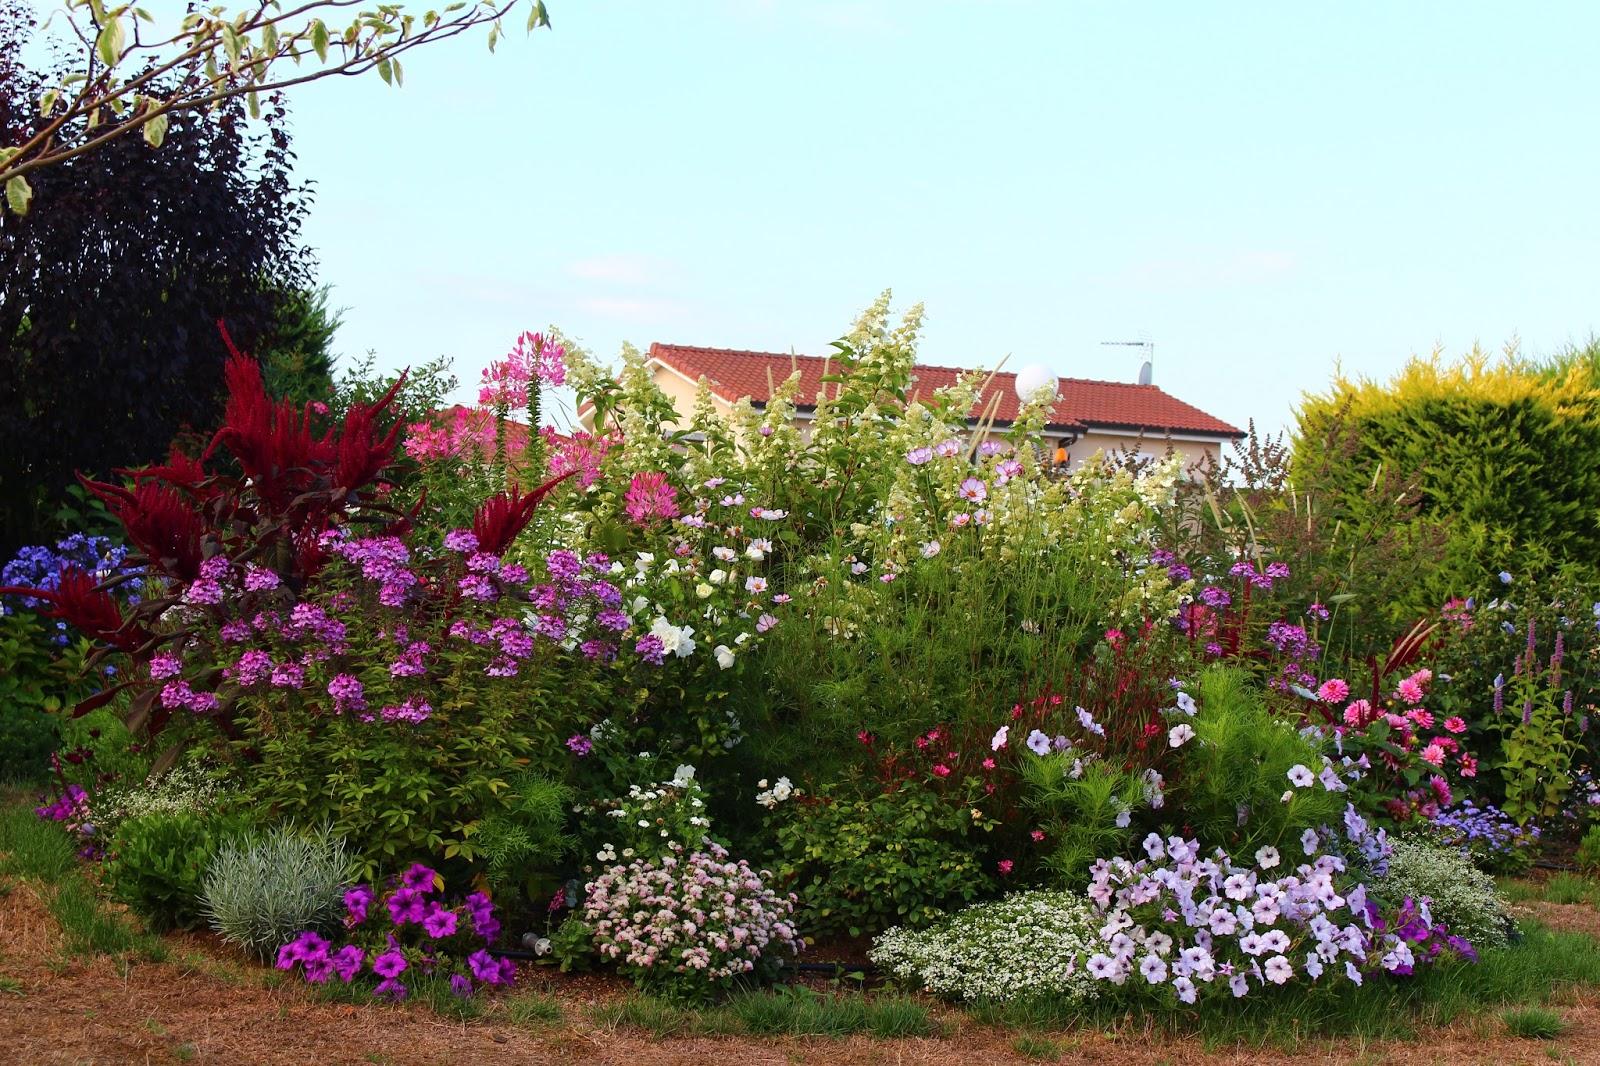 plantes vivaces plein soleil beautiful lupins urussellu en mlange extra with plantes vivaces. Black Bedroom Furniture Sets. Home Design Ideas